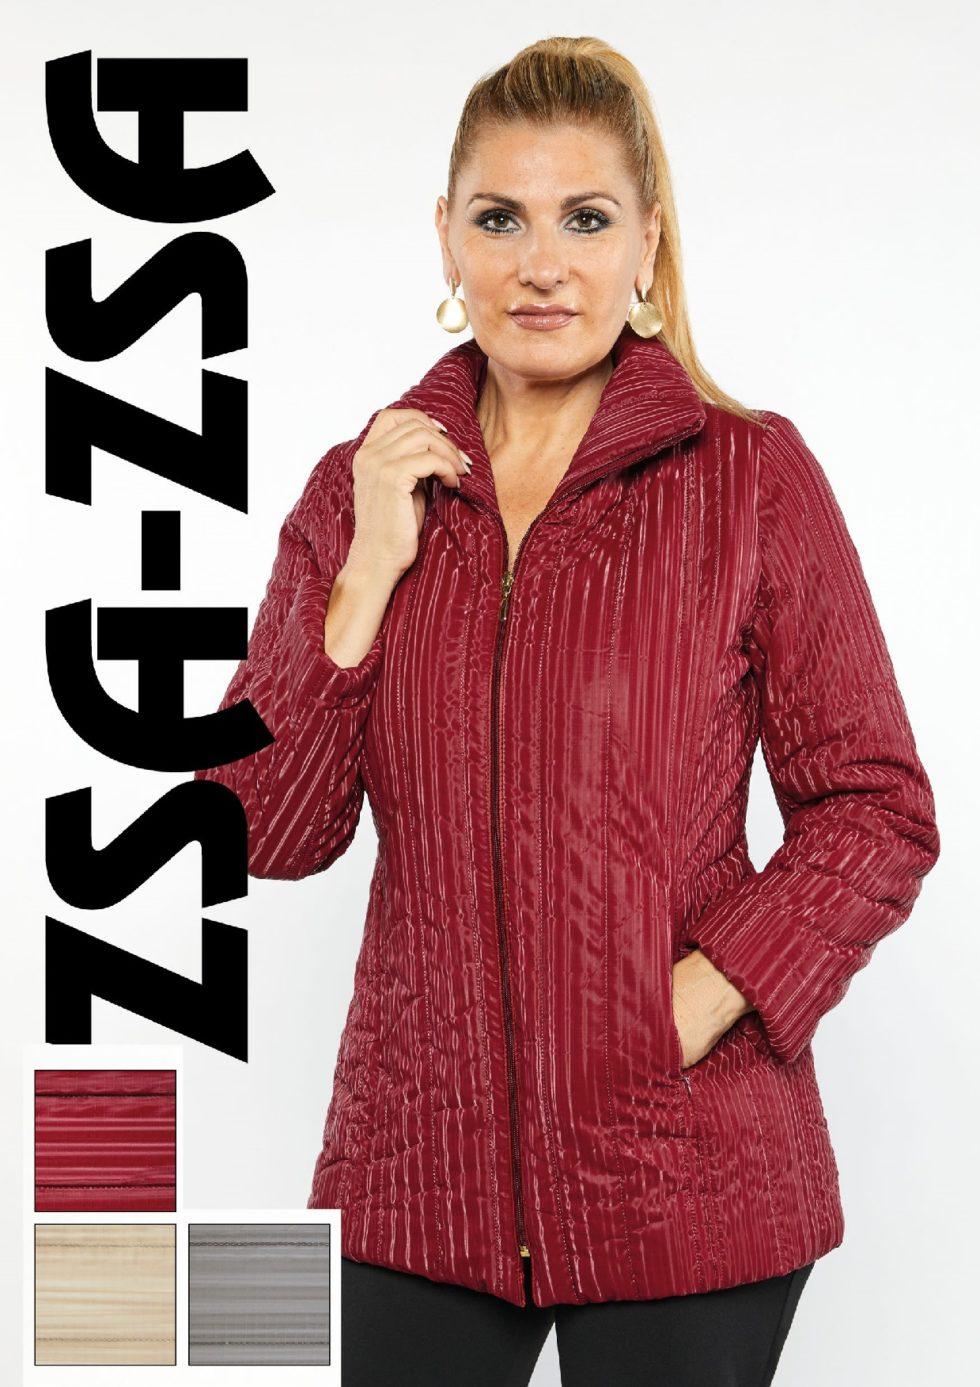 Zsa Zsa Catálogo FW 21-001